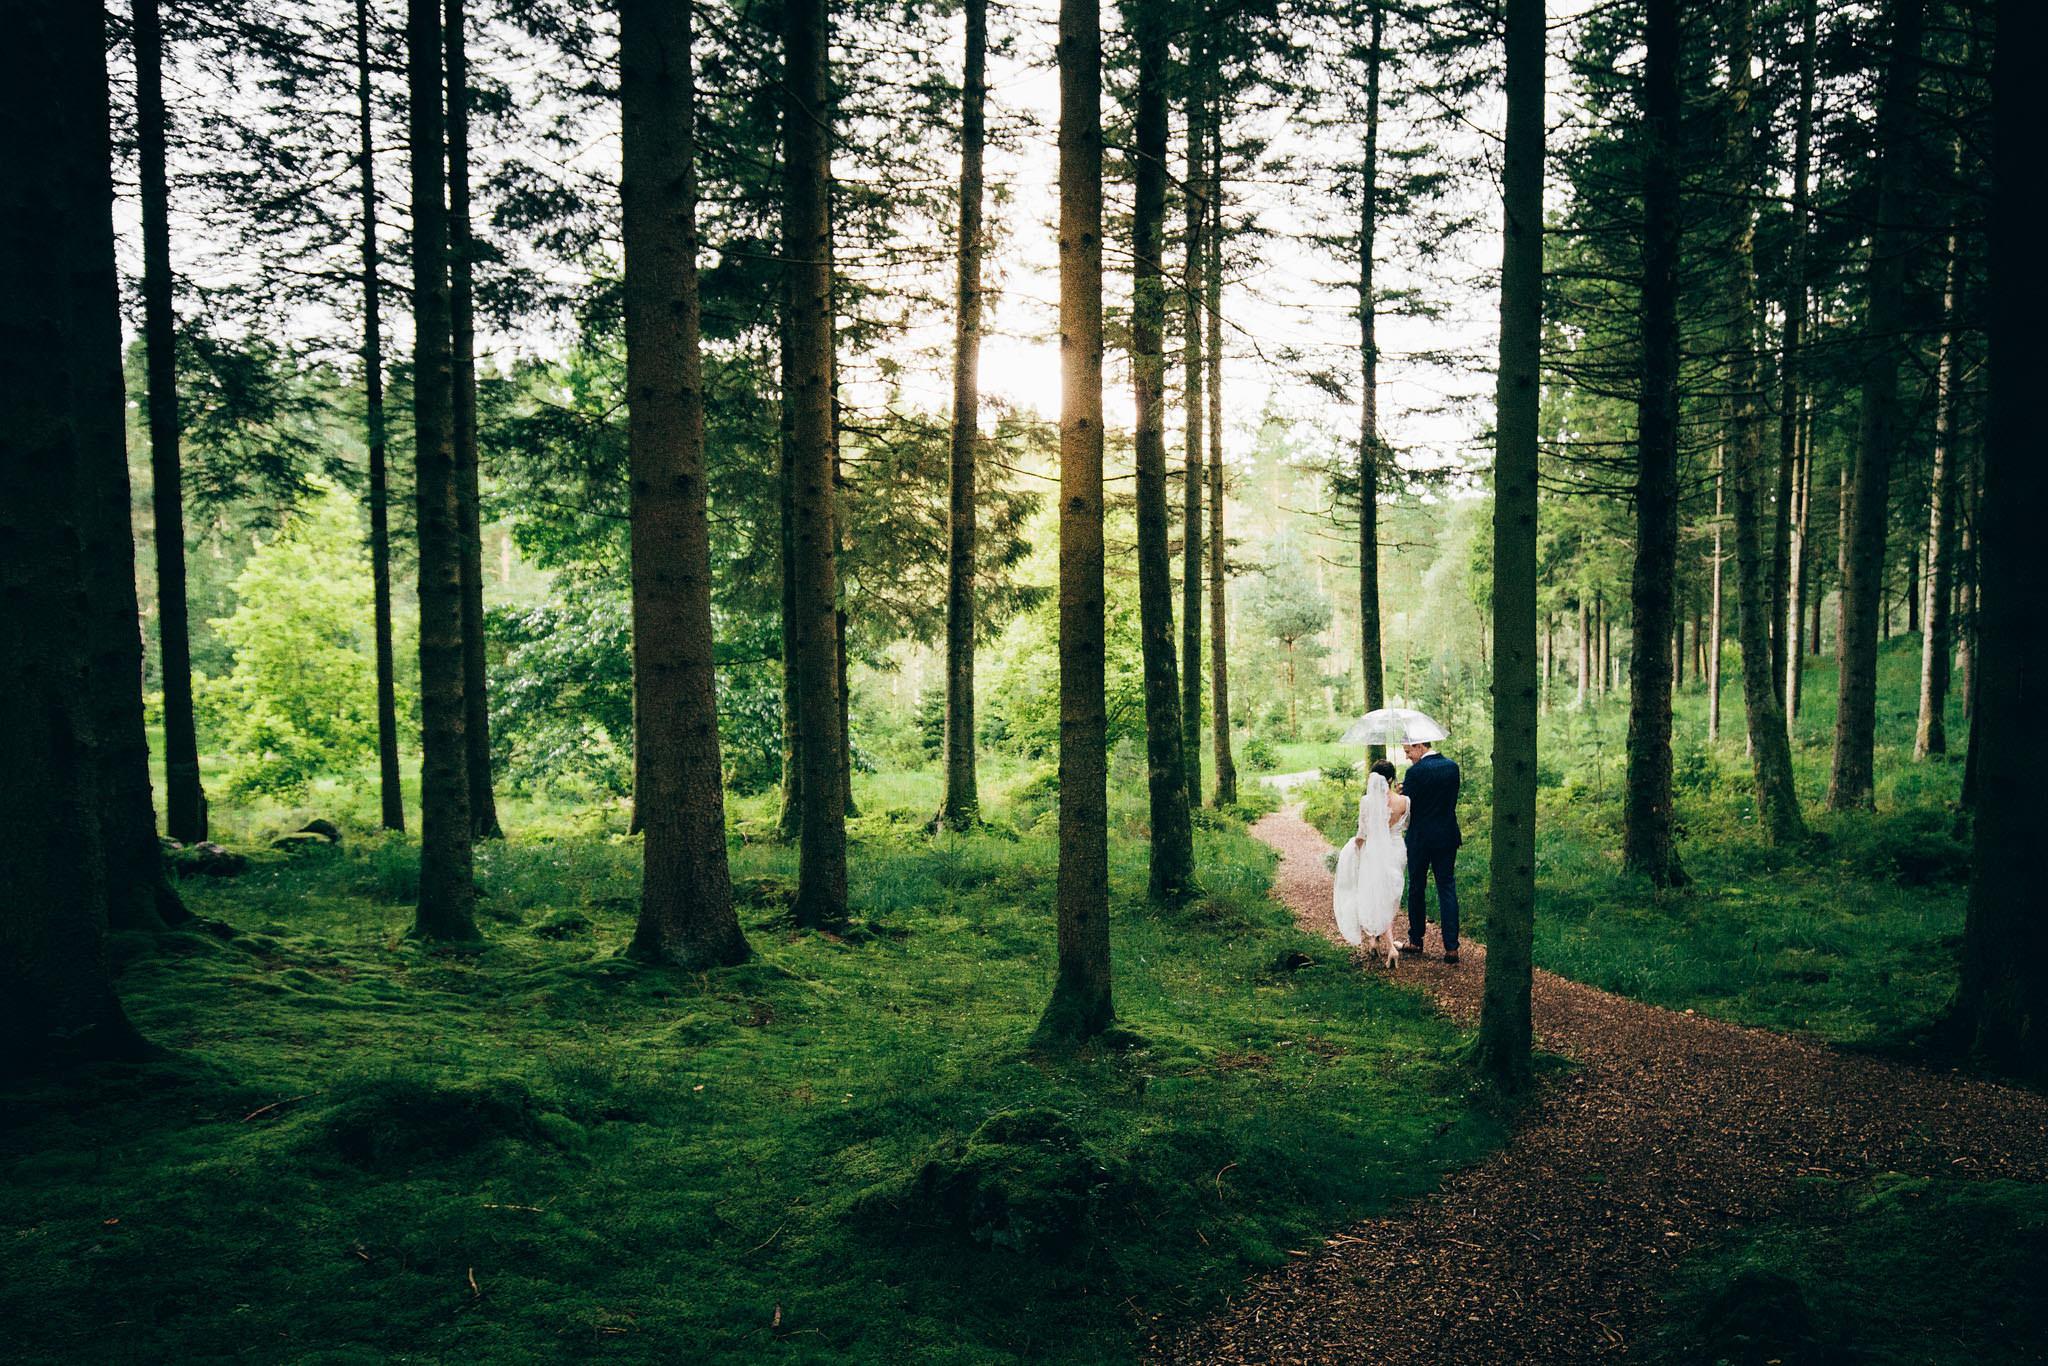 Norway+wedding+photographer+elopement+pre+wedding+Casey+Arneson-65.jpg